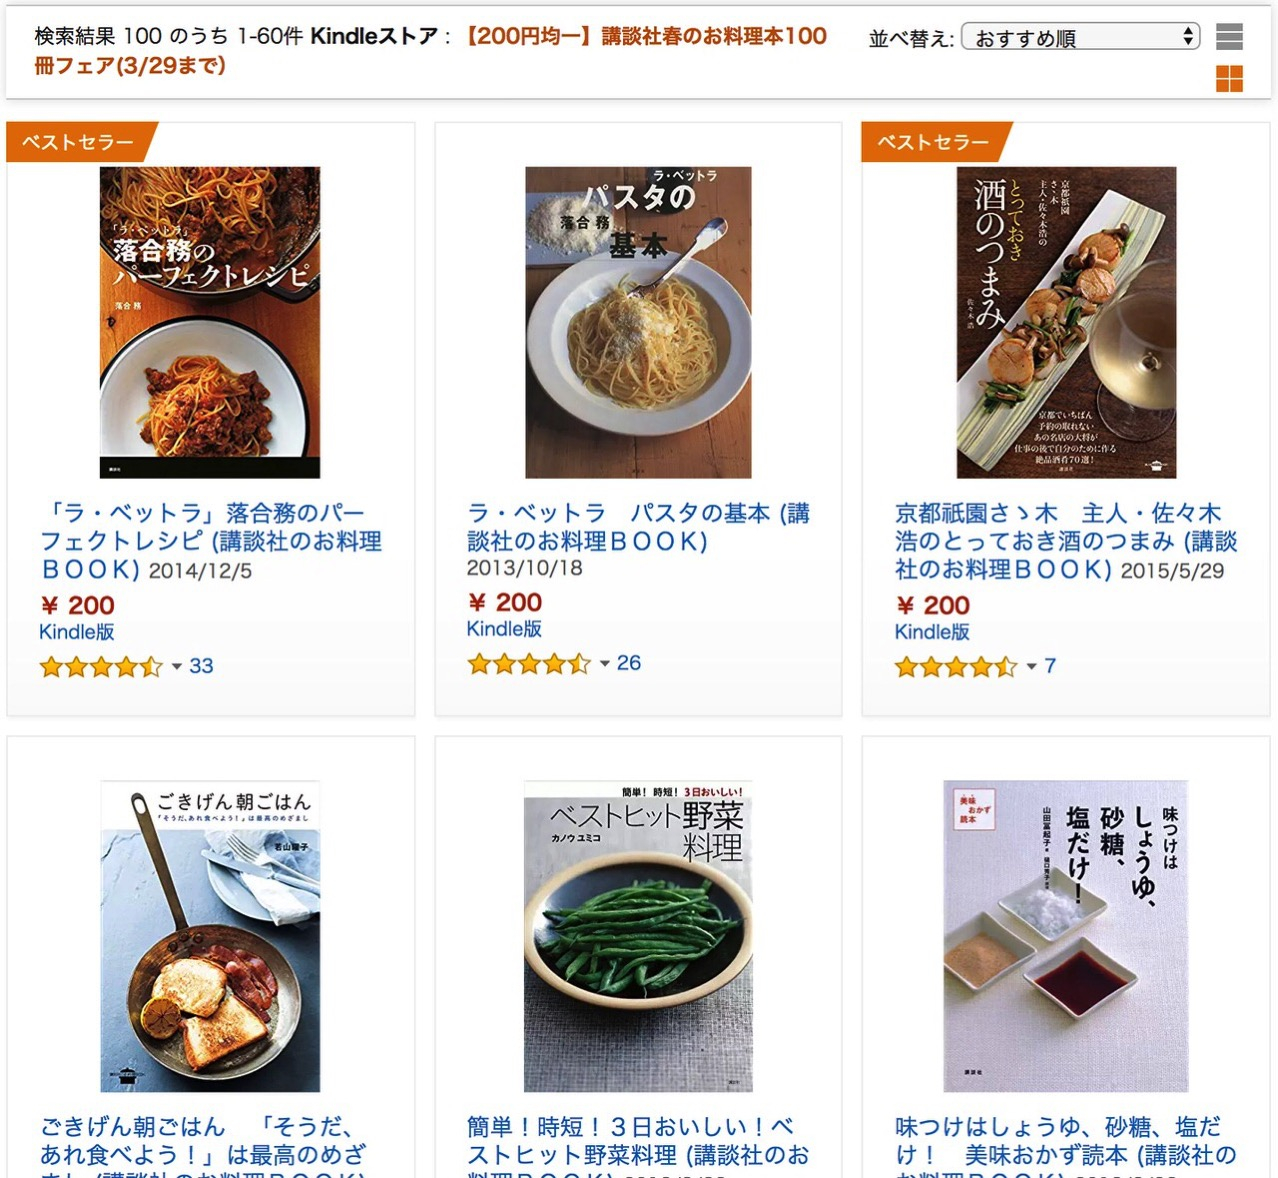 【Kindleセール】200円均一「講談社春のお料理本100冊フェア」(3/29まで)